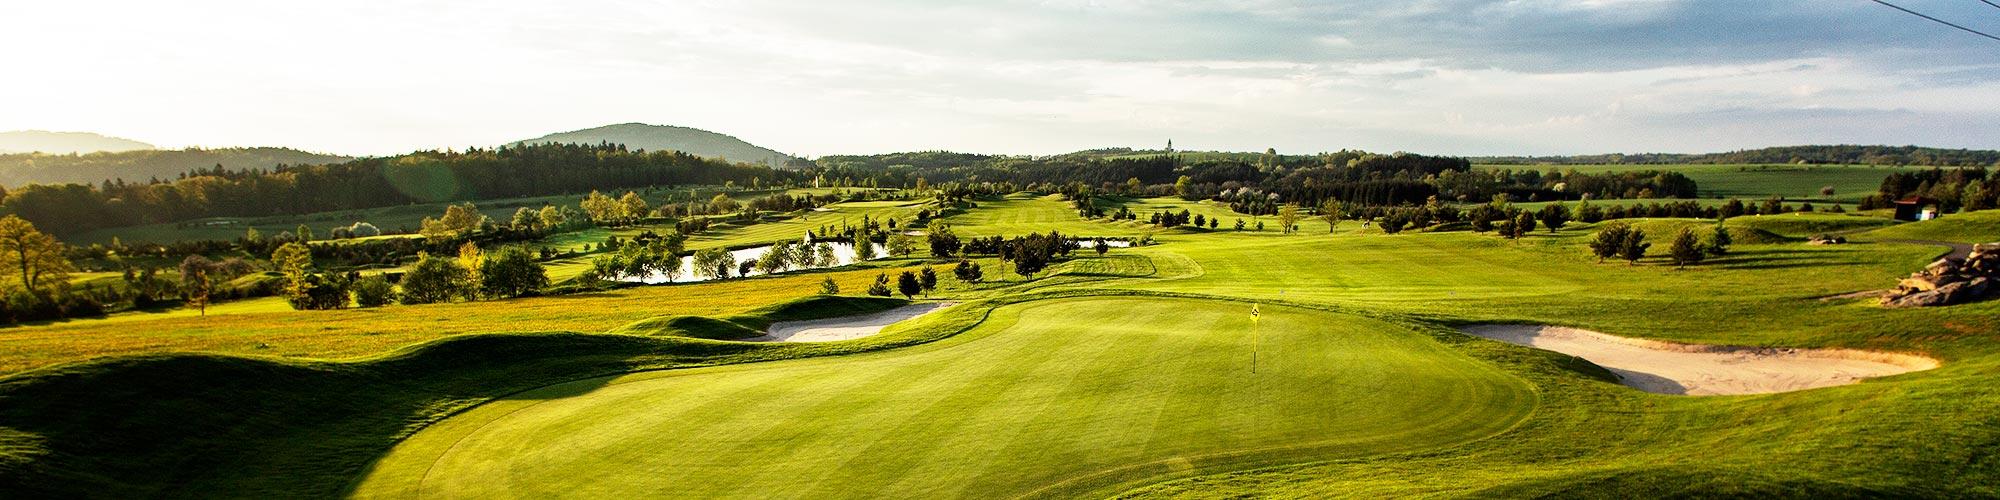 Golf-Gruppenreisen-Prag-Konopiste-Golfclub